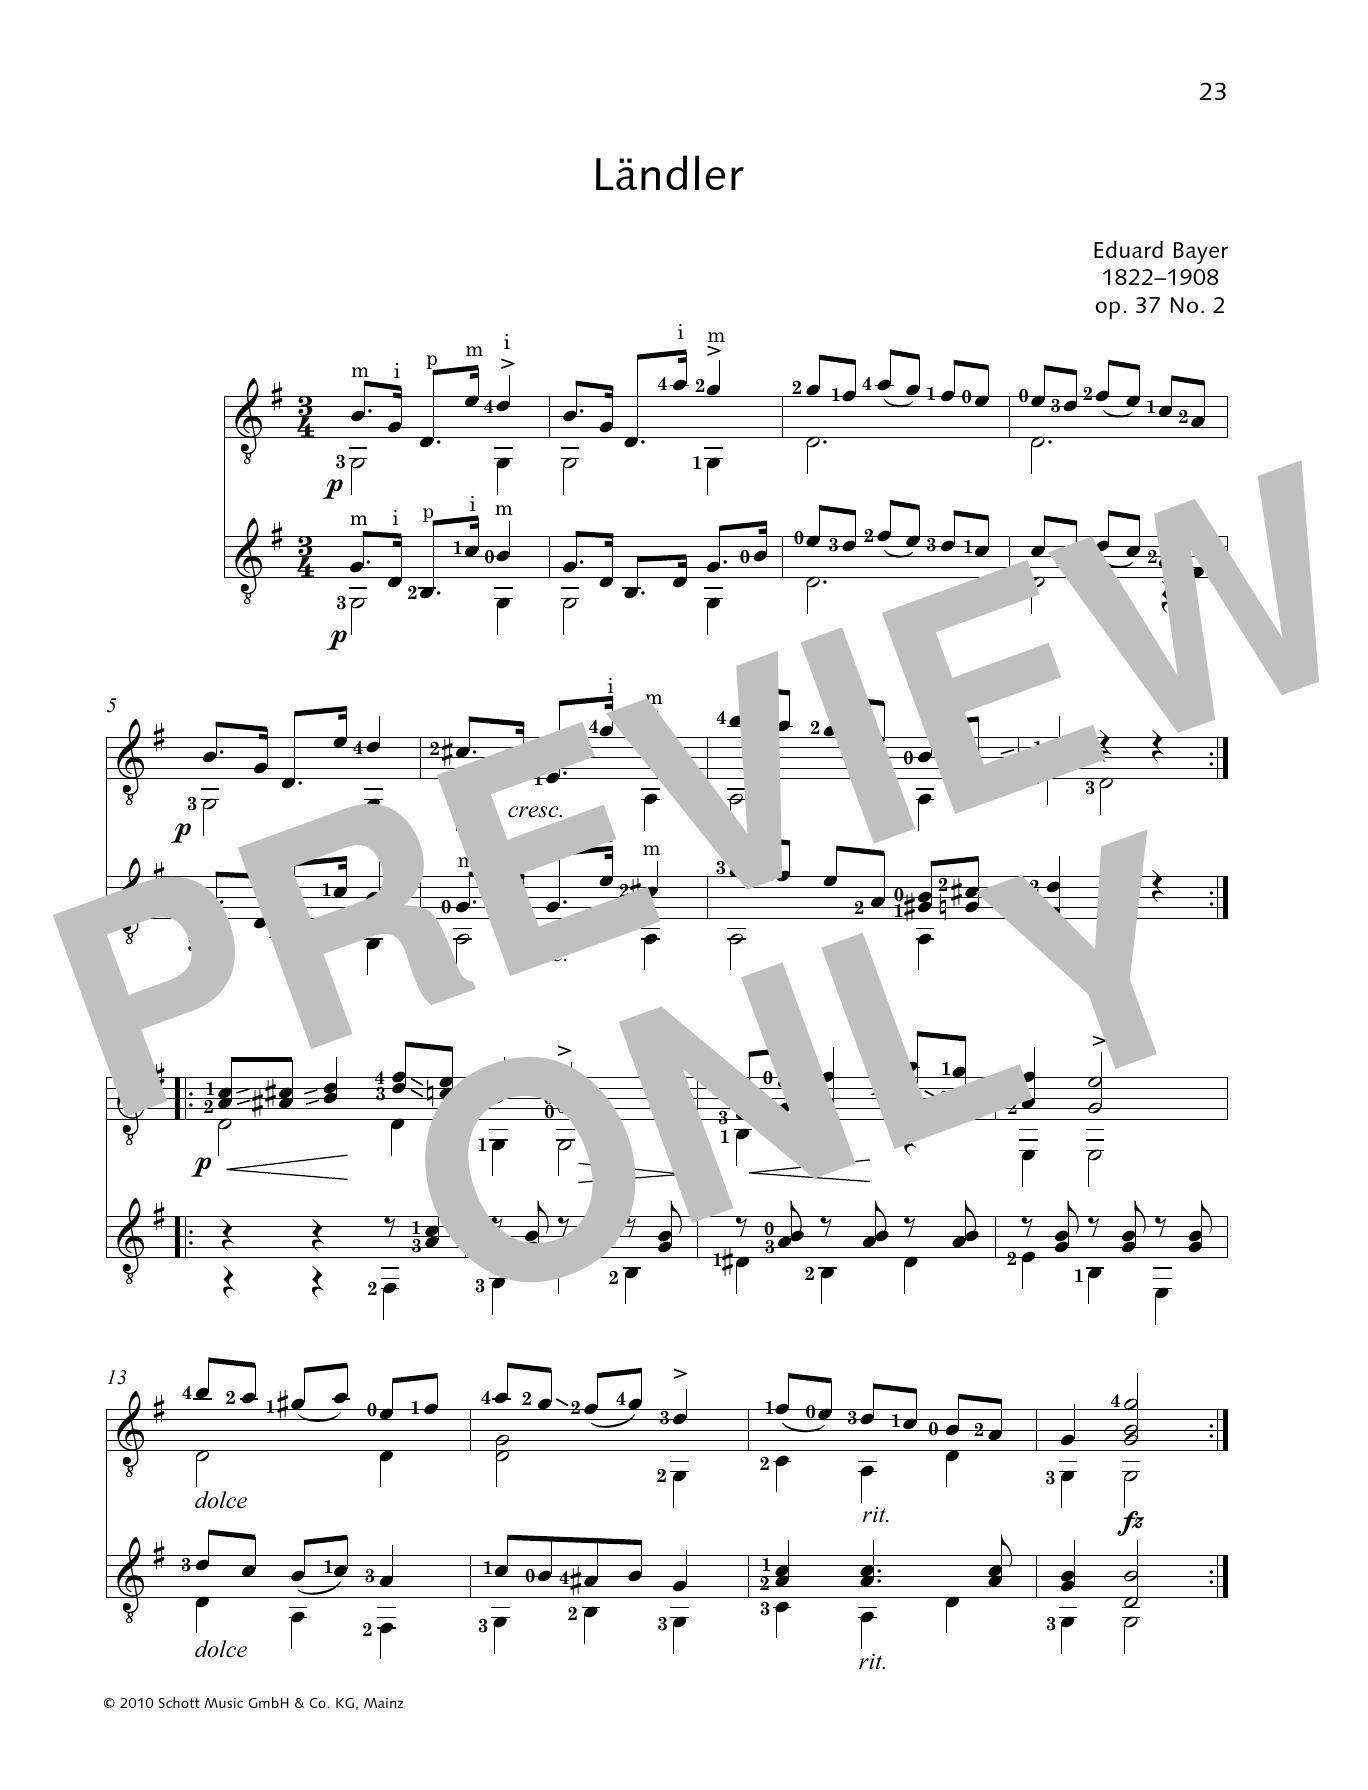 Landler - Full Score Sheet Music